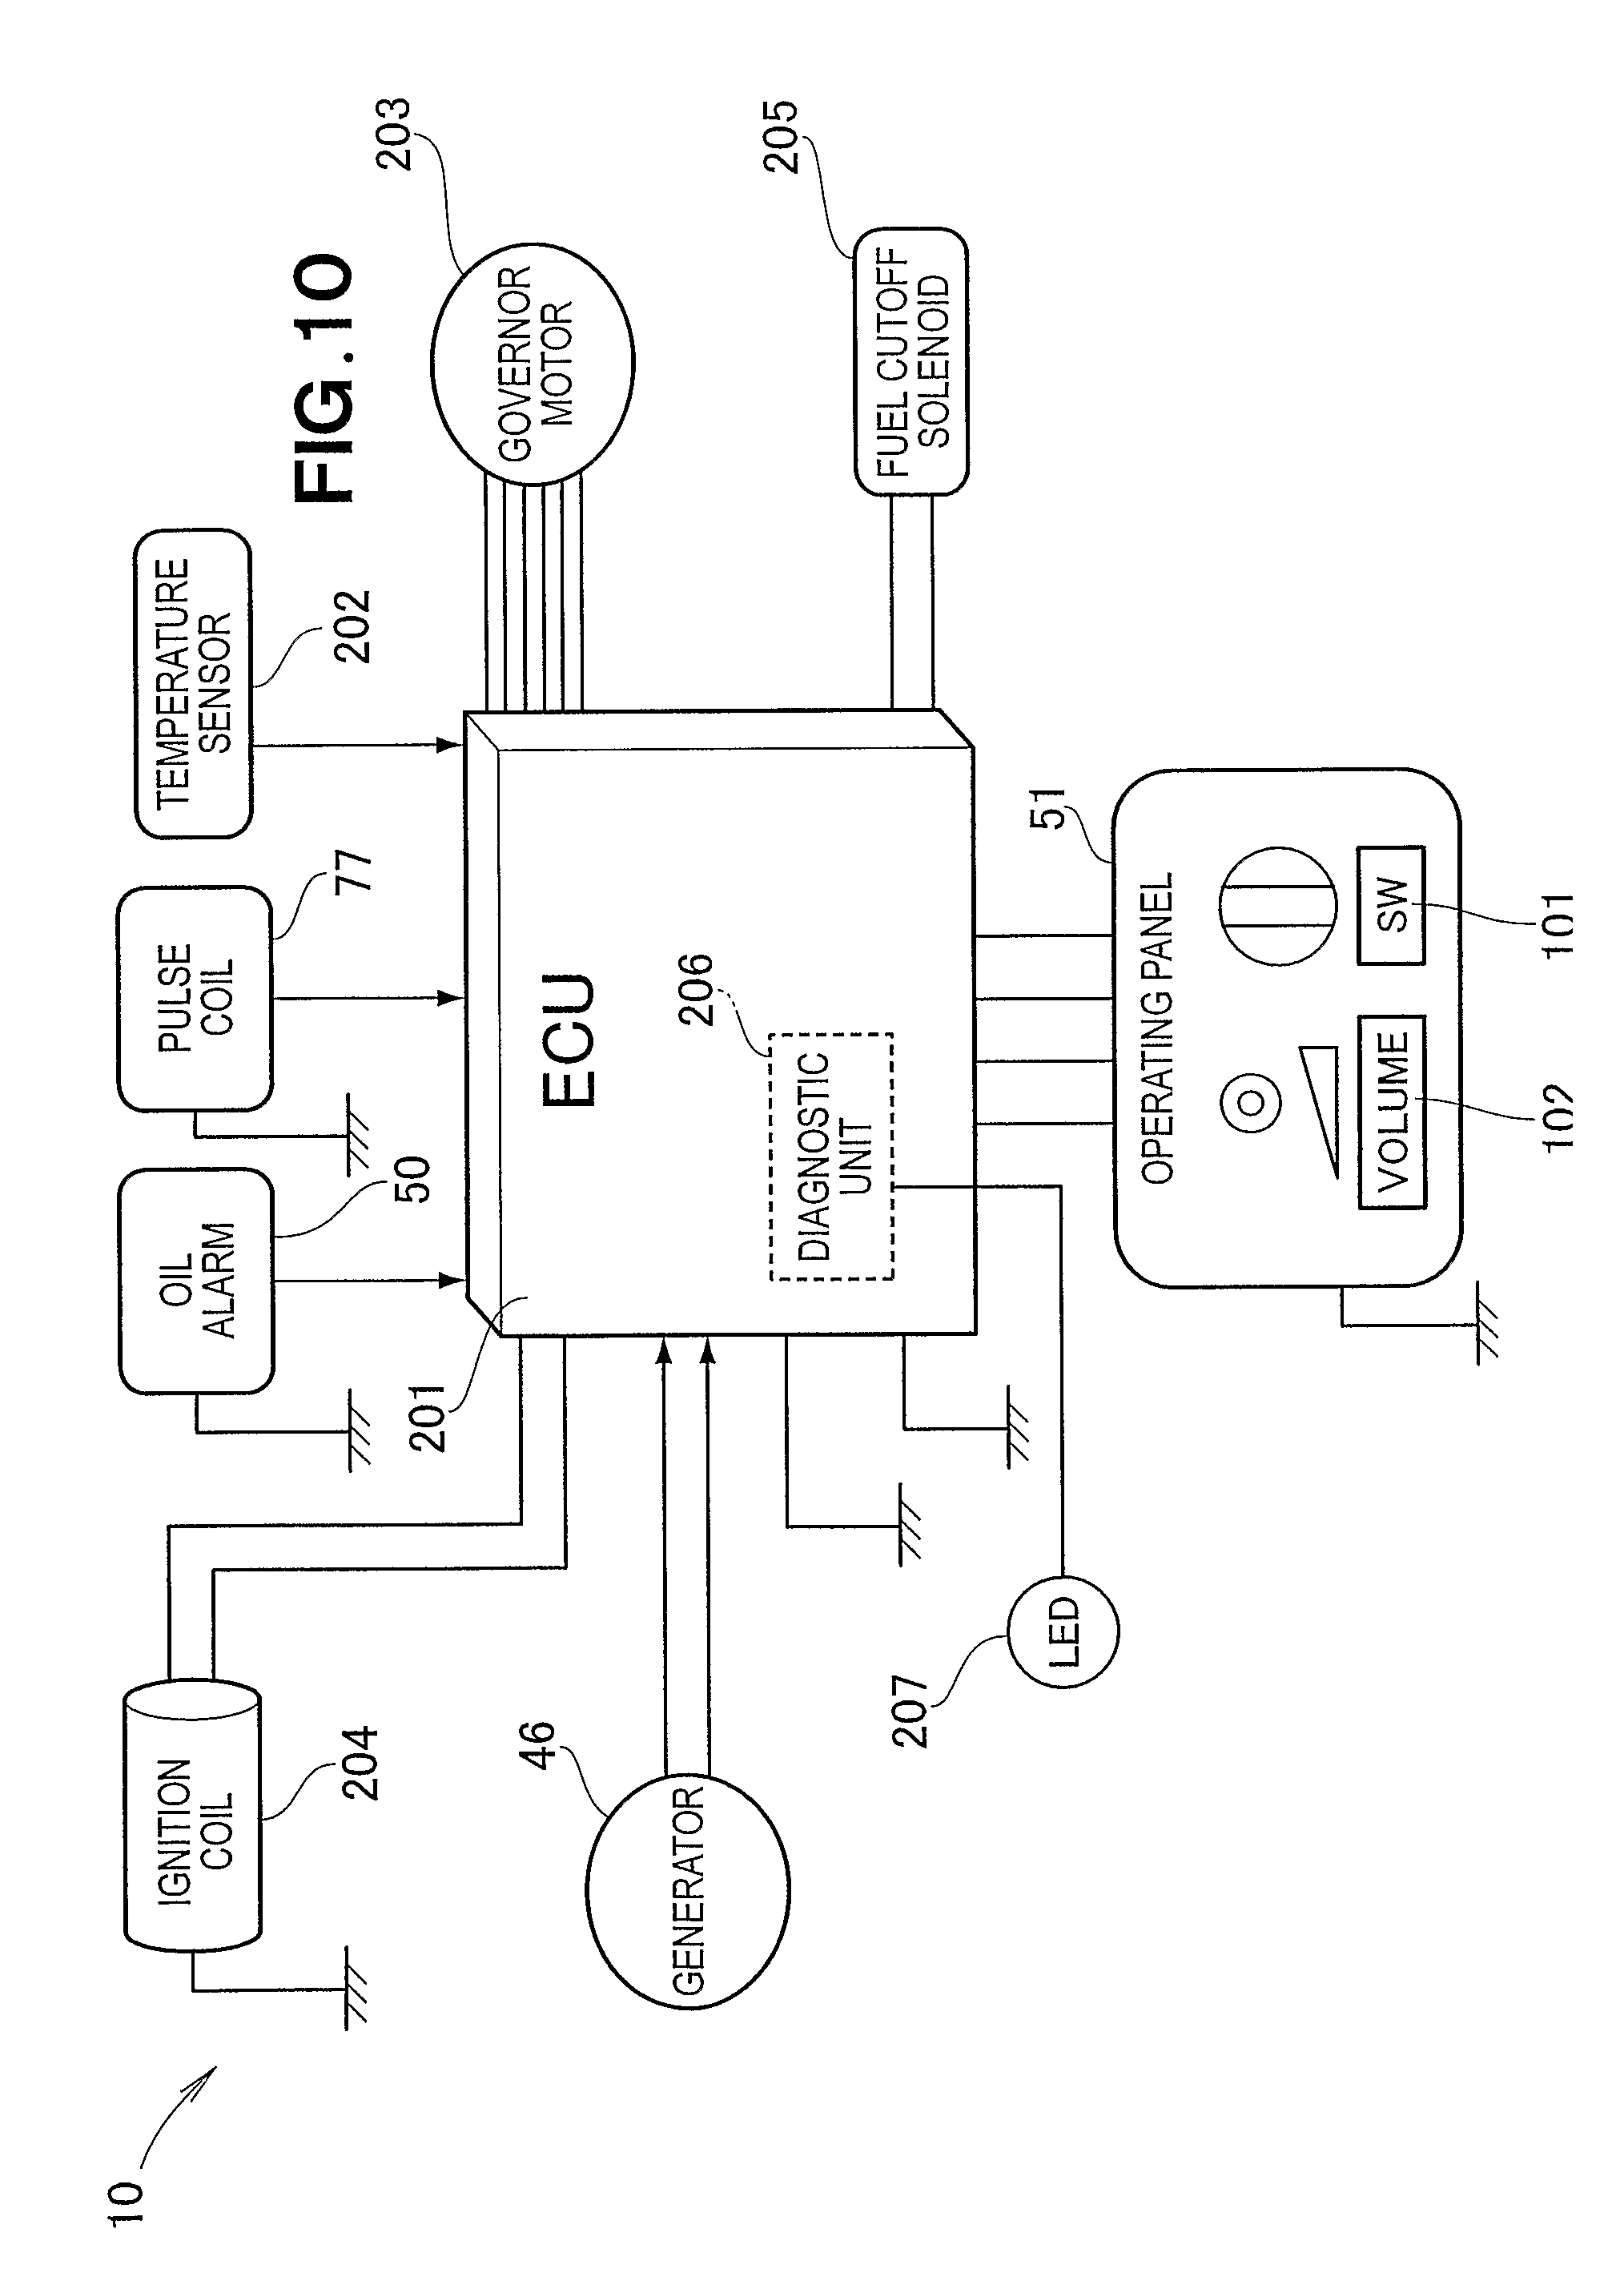 Fg Wilson Wiring Diagram Pdf: Fg wilson generator wiring